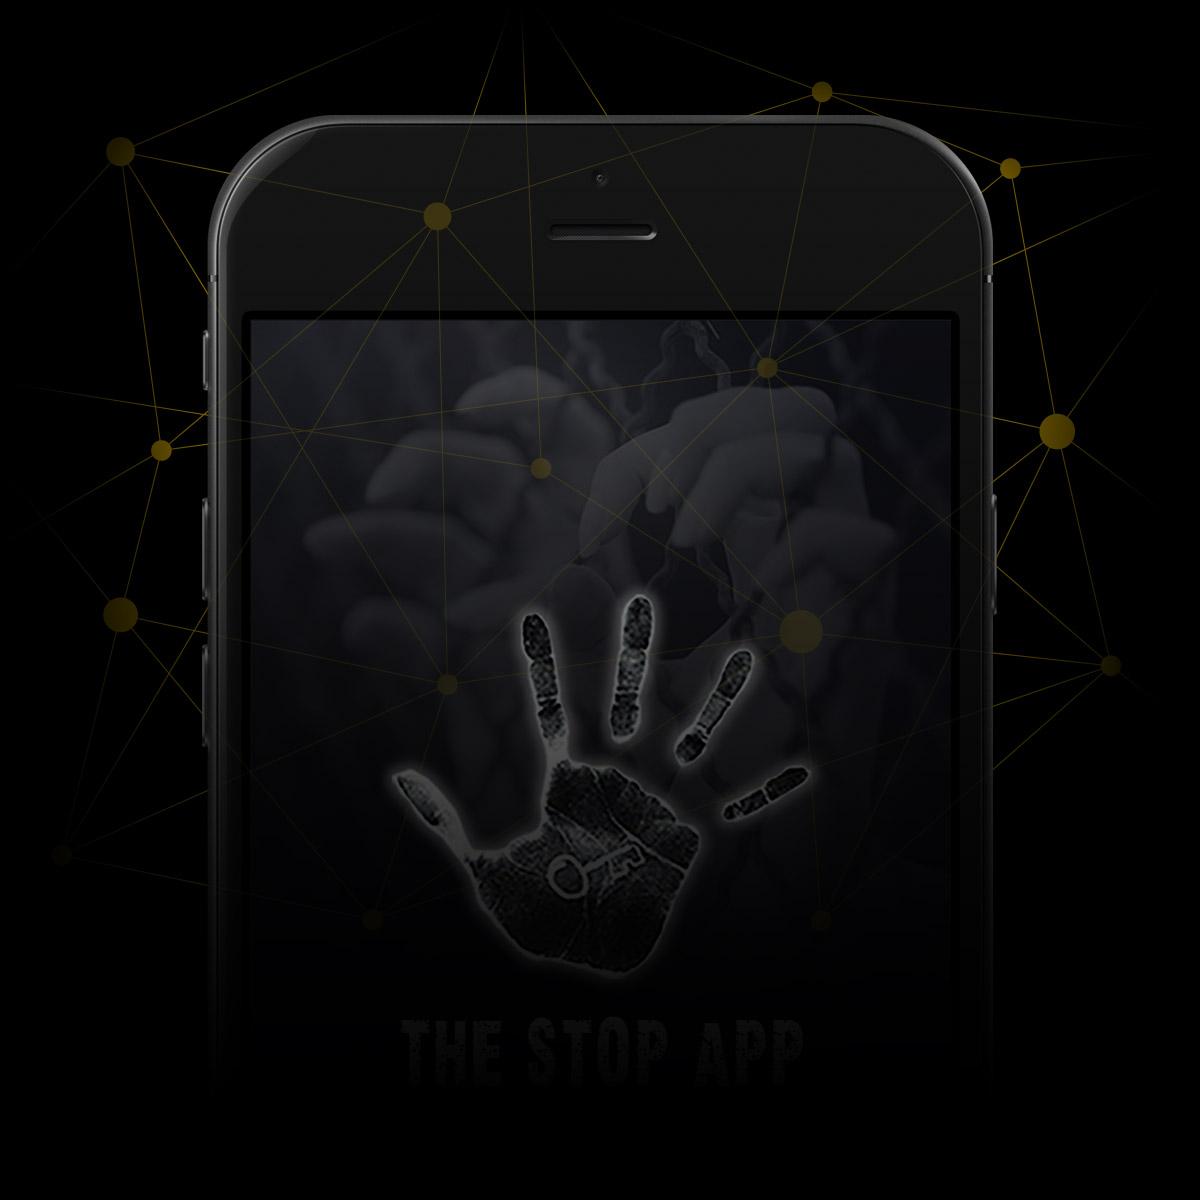 Image of Stop App